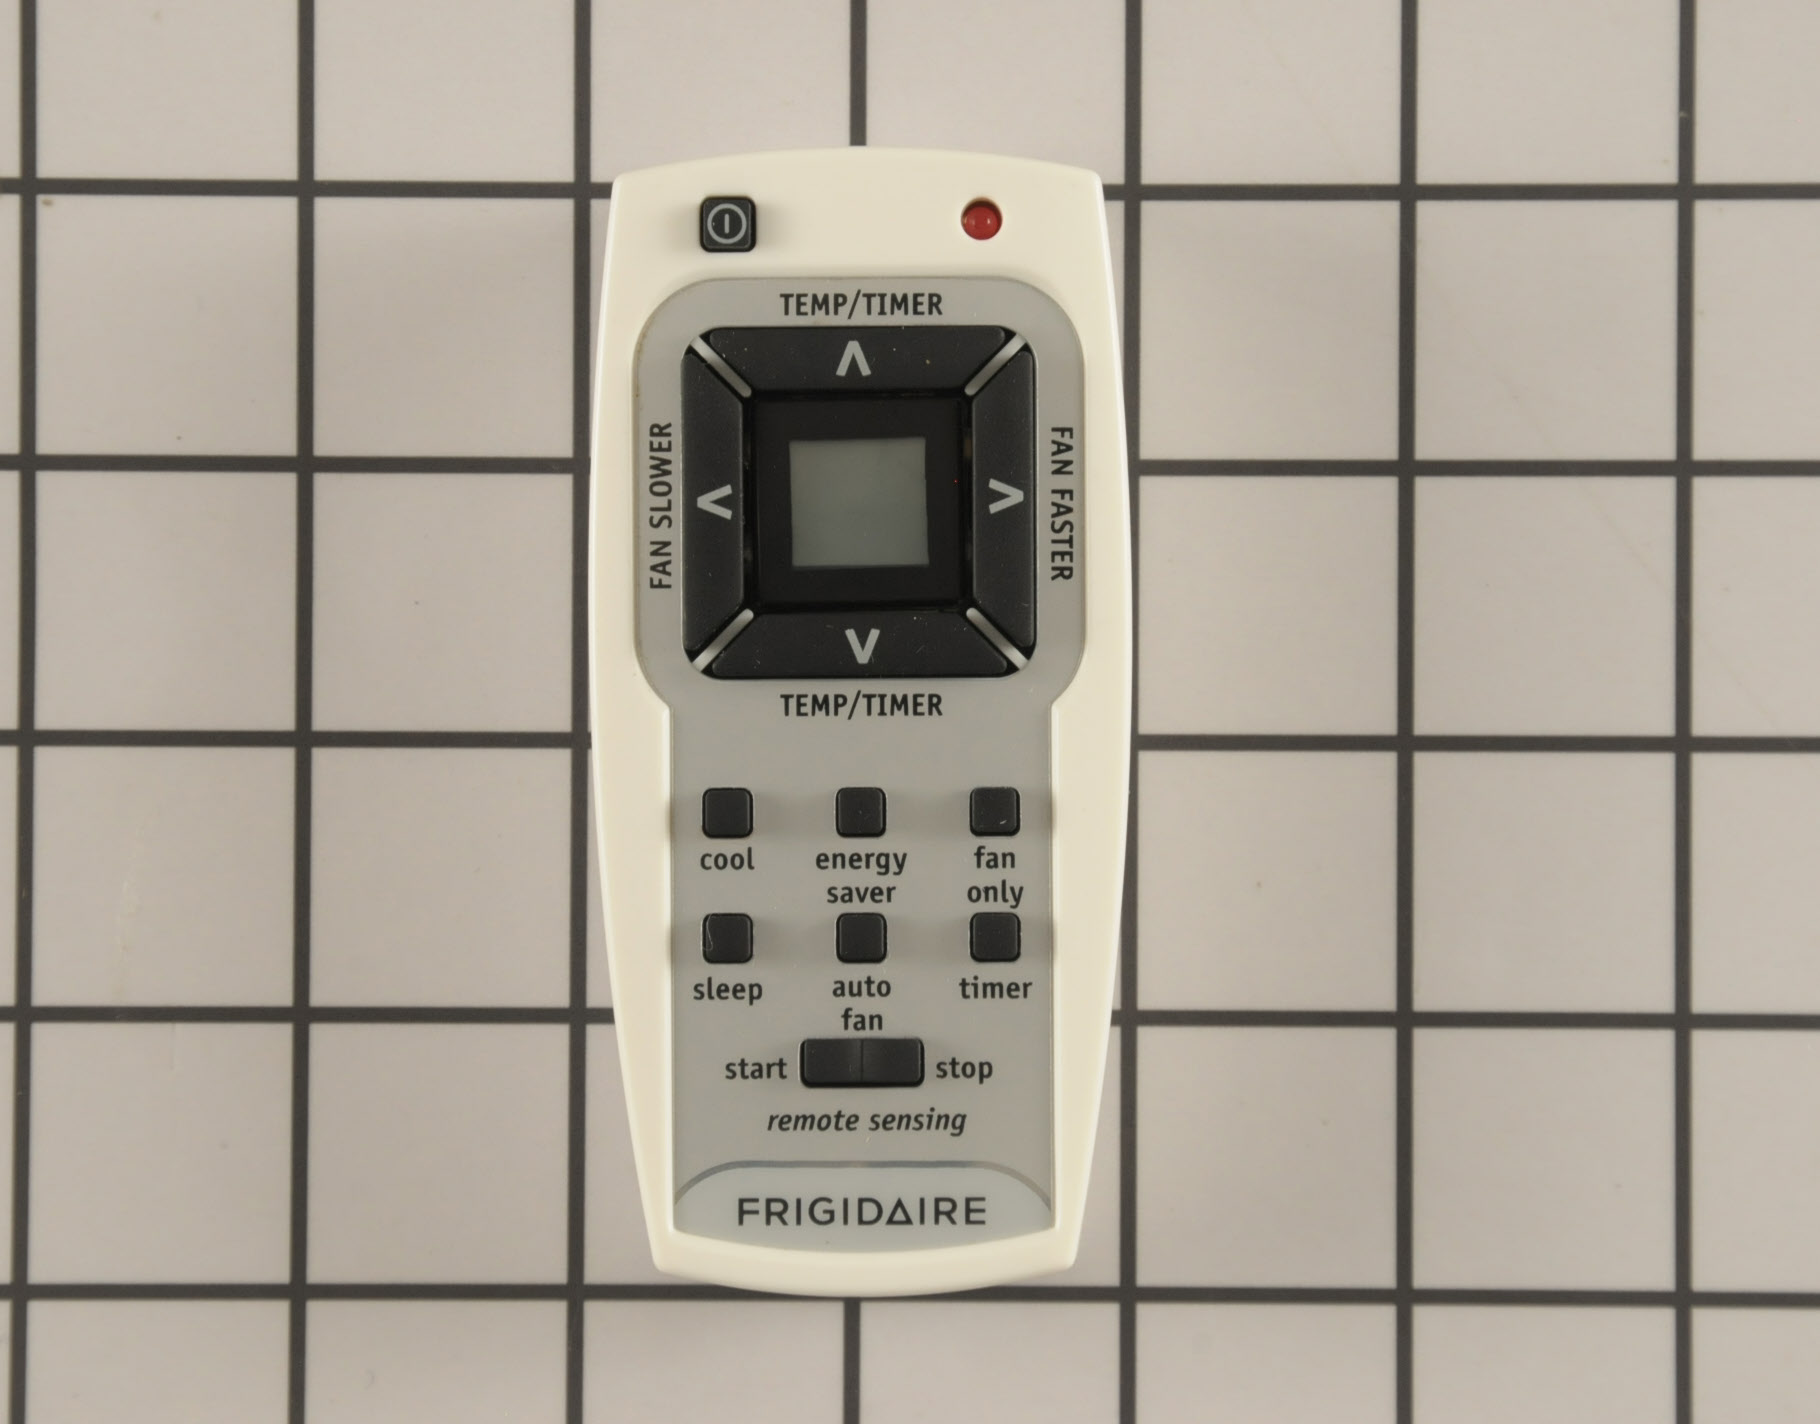 Frigidaire Air Conditioner Part # 5304476851 - Remote Control